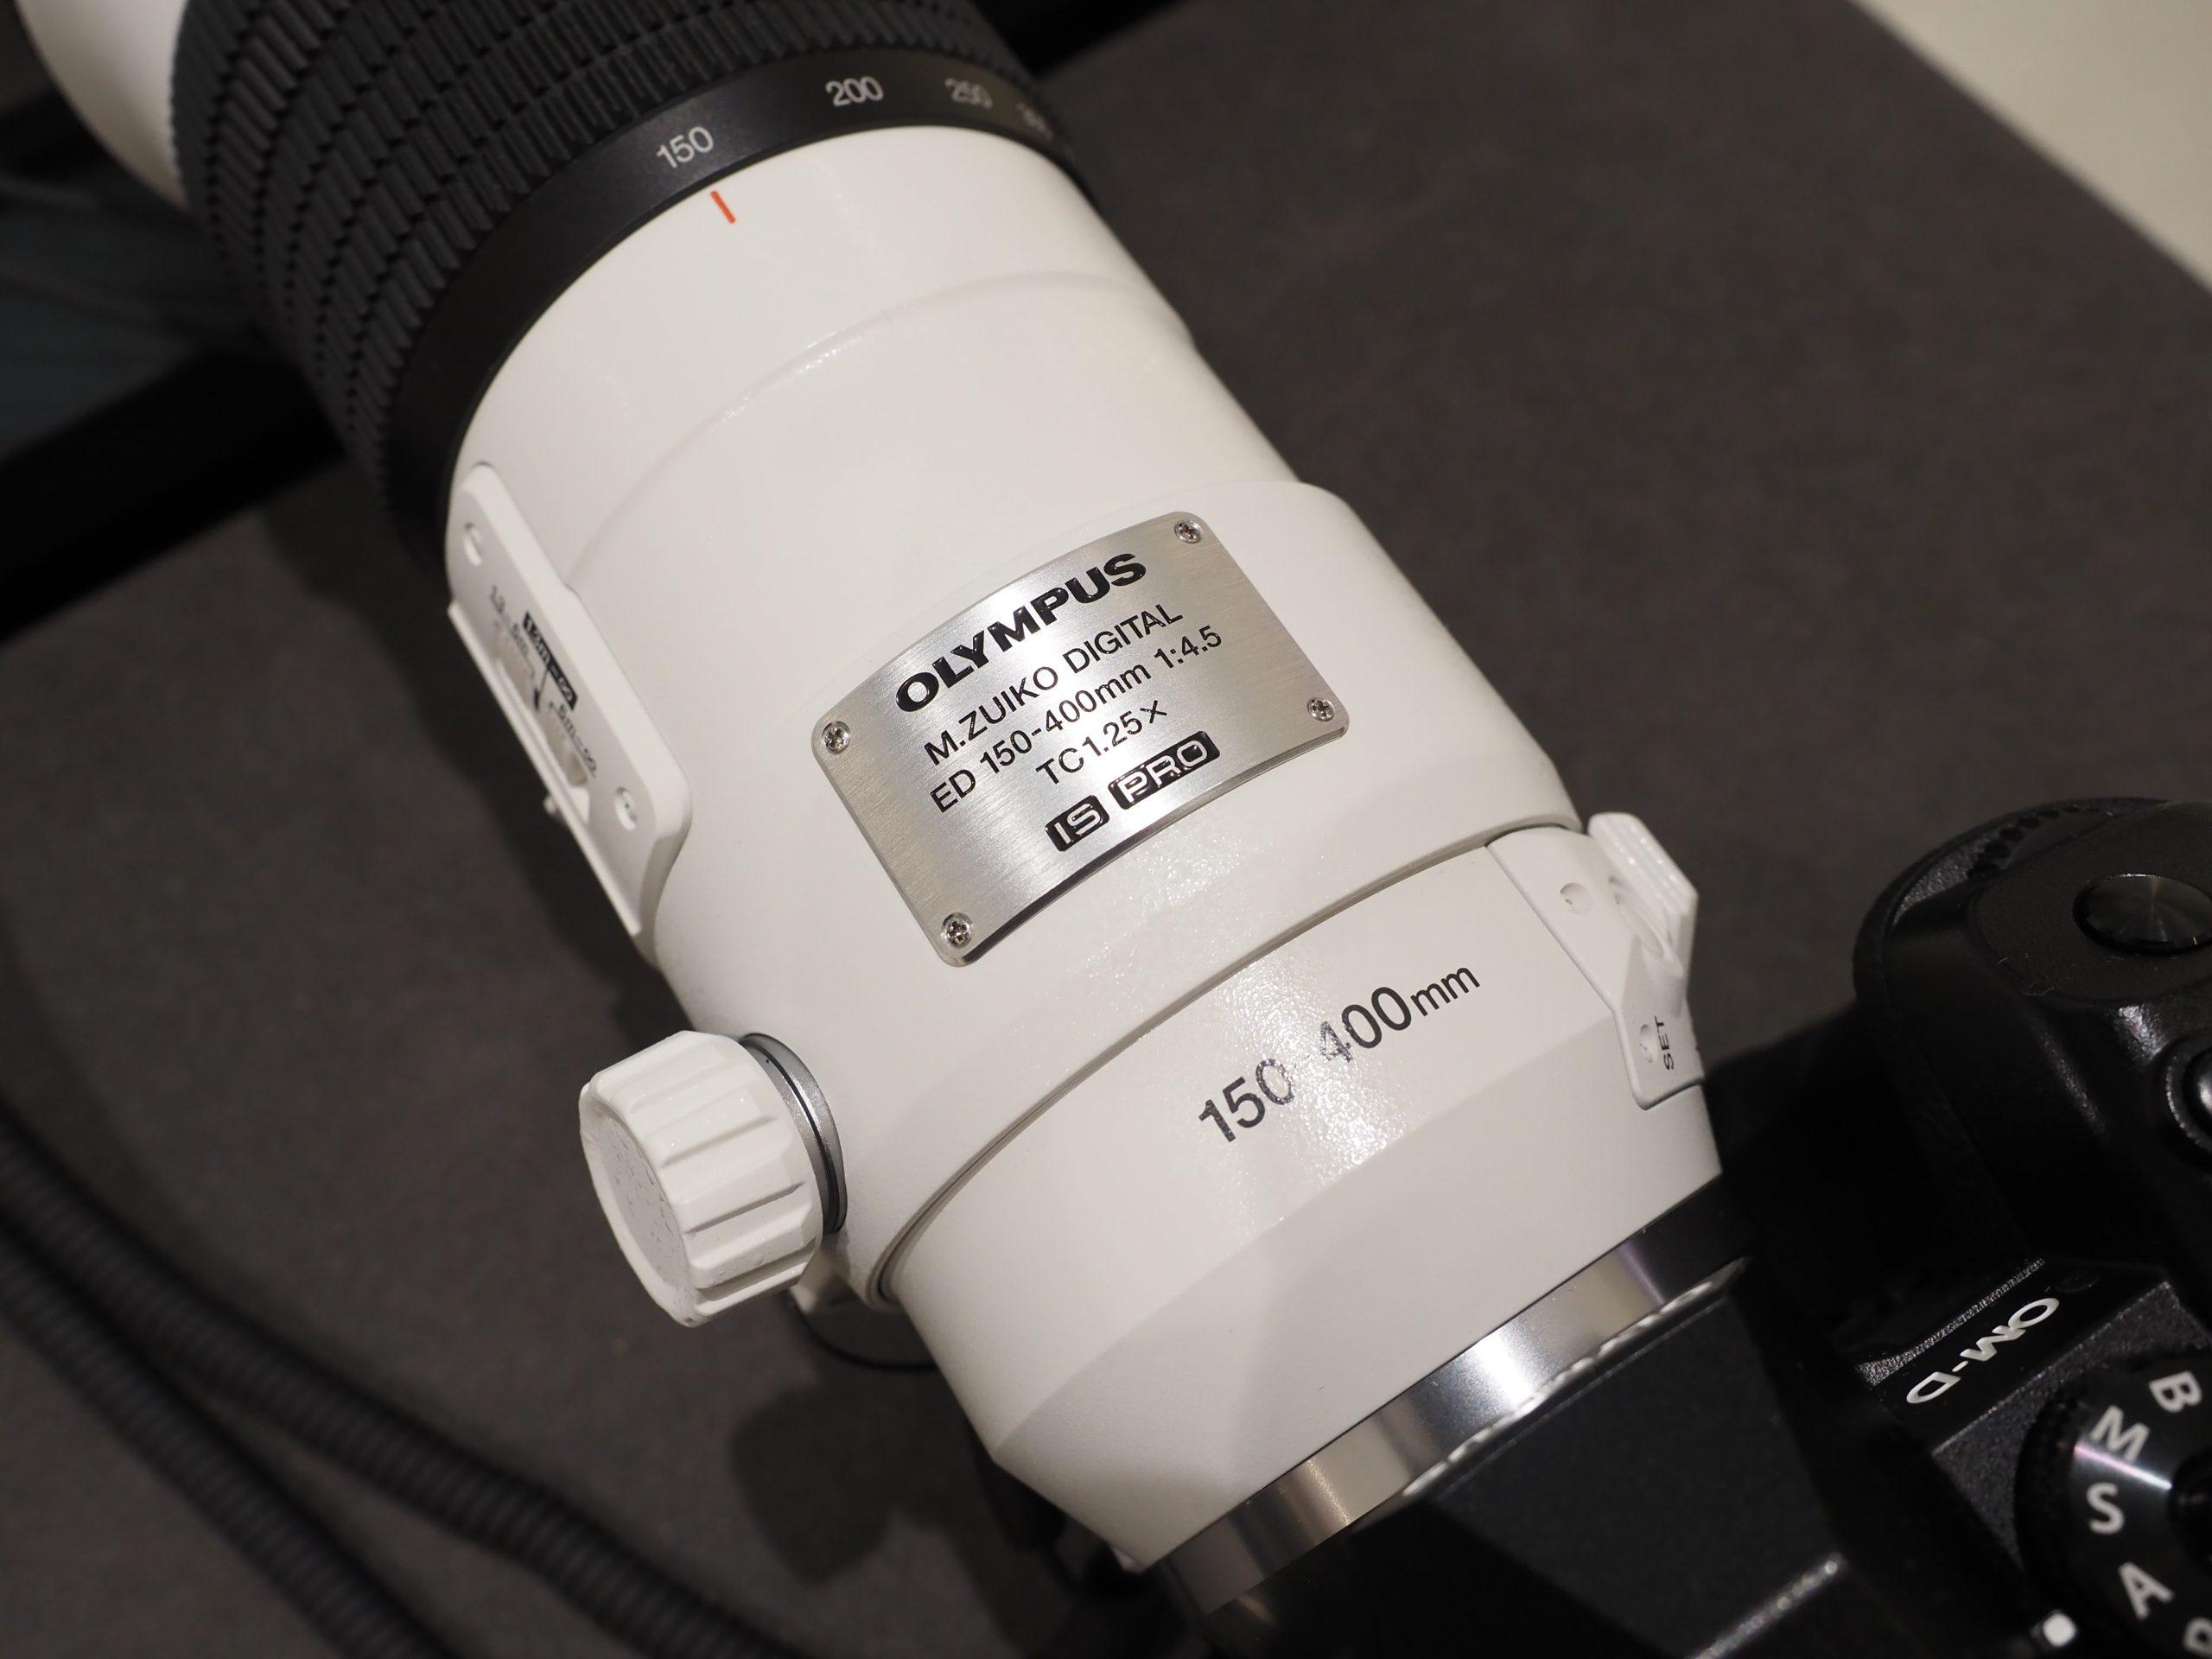 【OLYMPUS】M.ZUIKO DIGITAL ED 150-400mm F4.5 TC1.25x IS PROファーストインプレッション